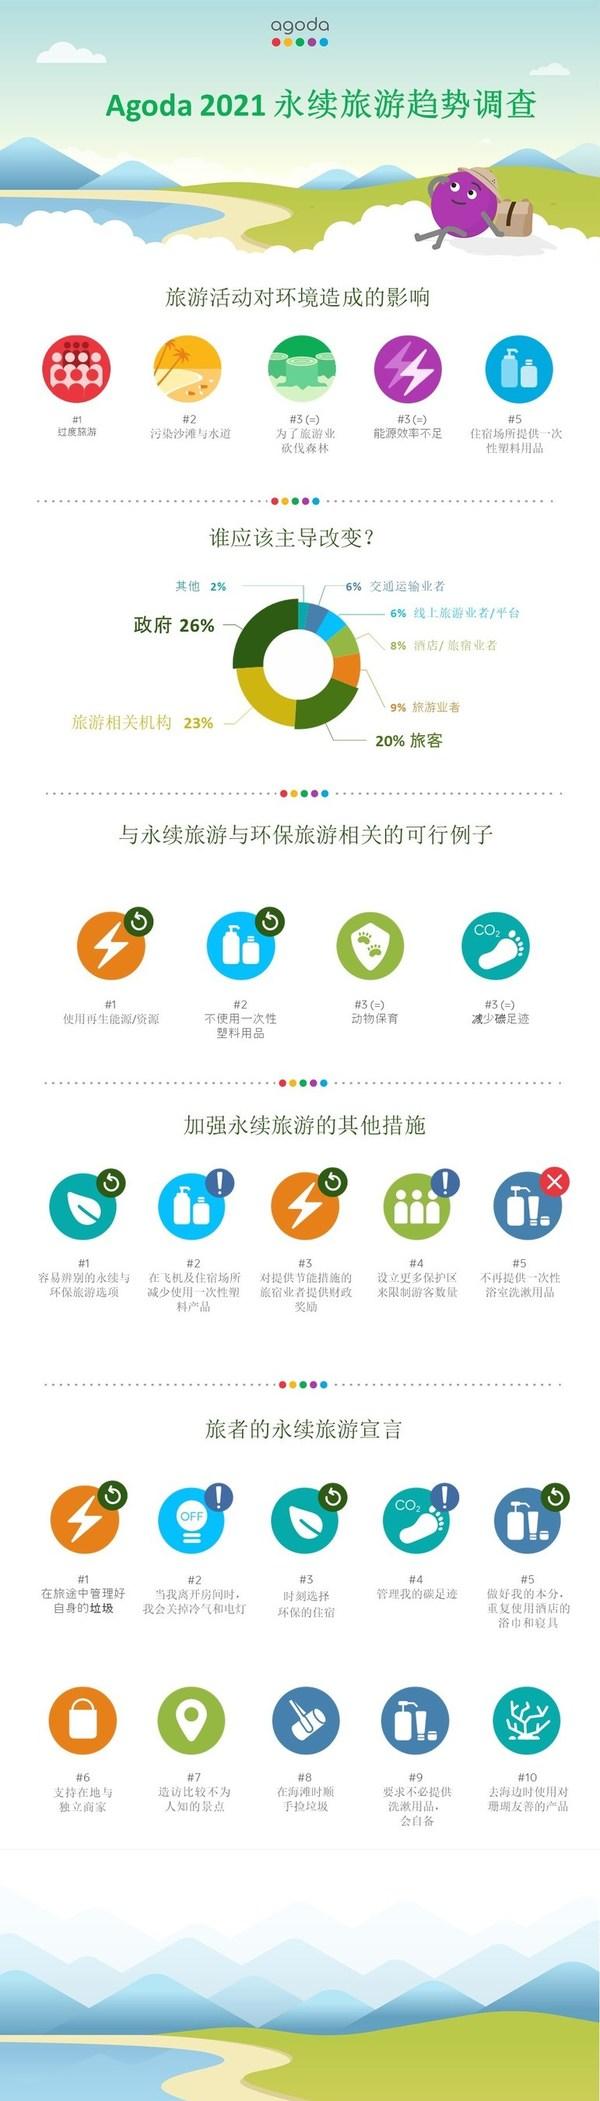 Agoda發布可持續旅遊趨勢調查報告